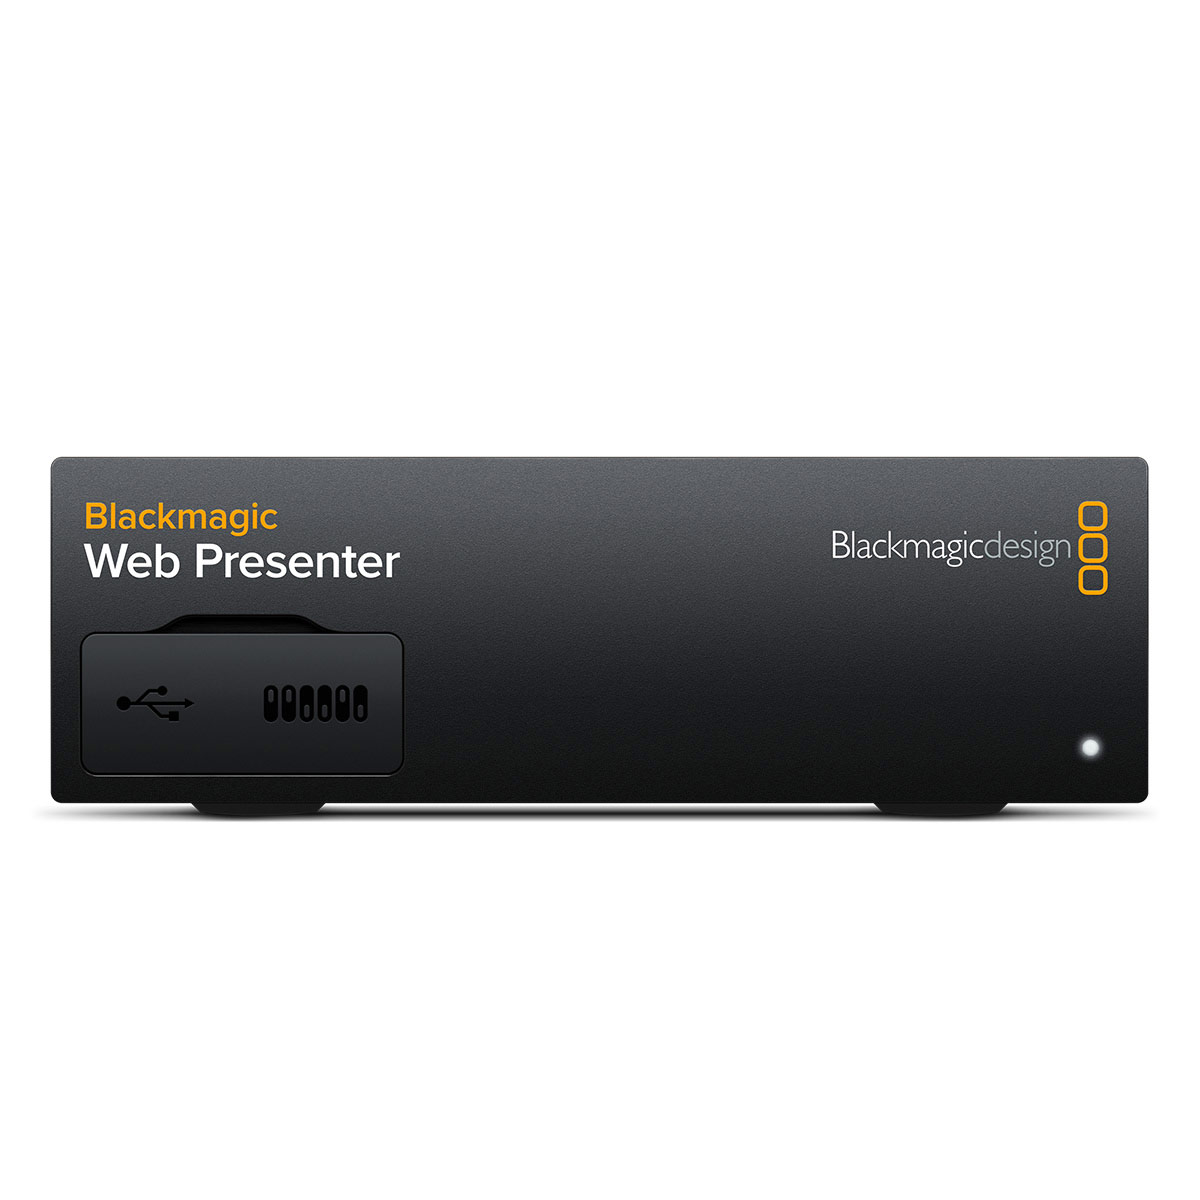 Blackmagic Design Web Presenter Jigsaw24